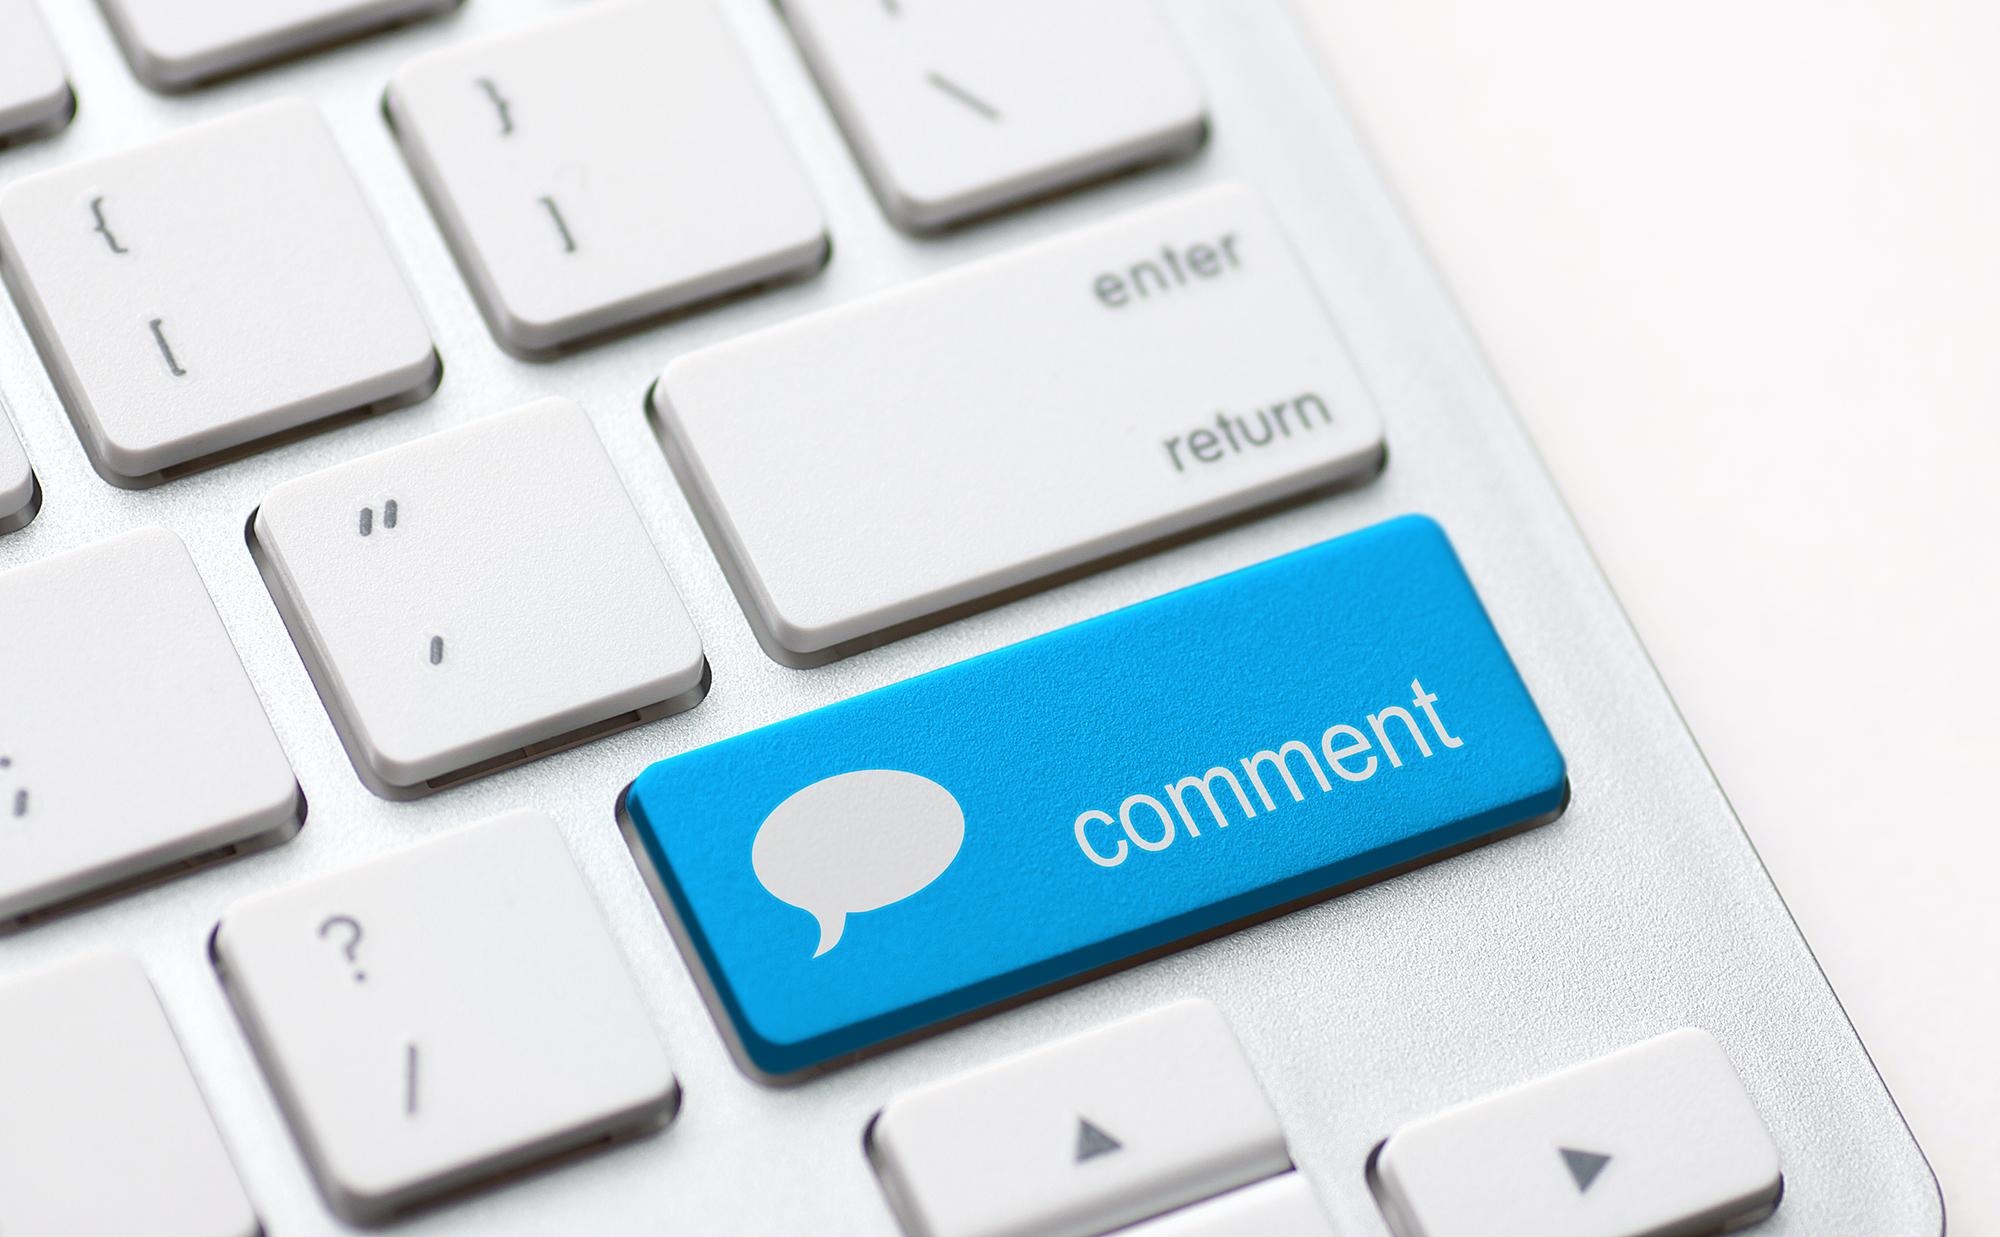 Tecla de comentários